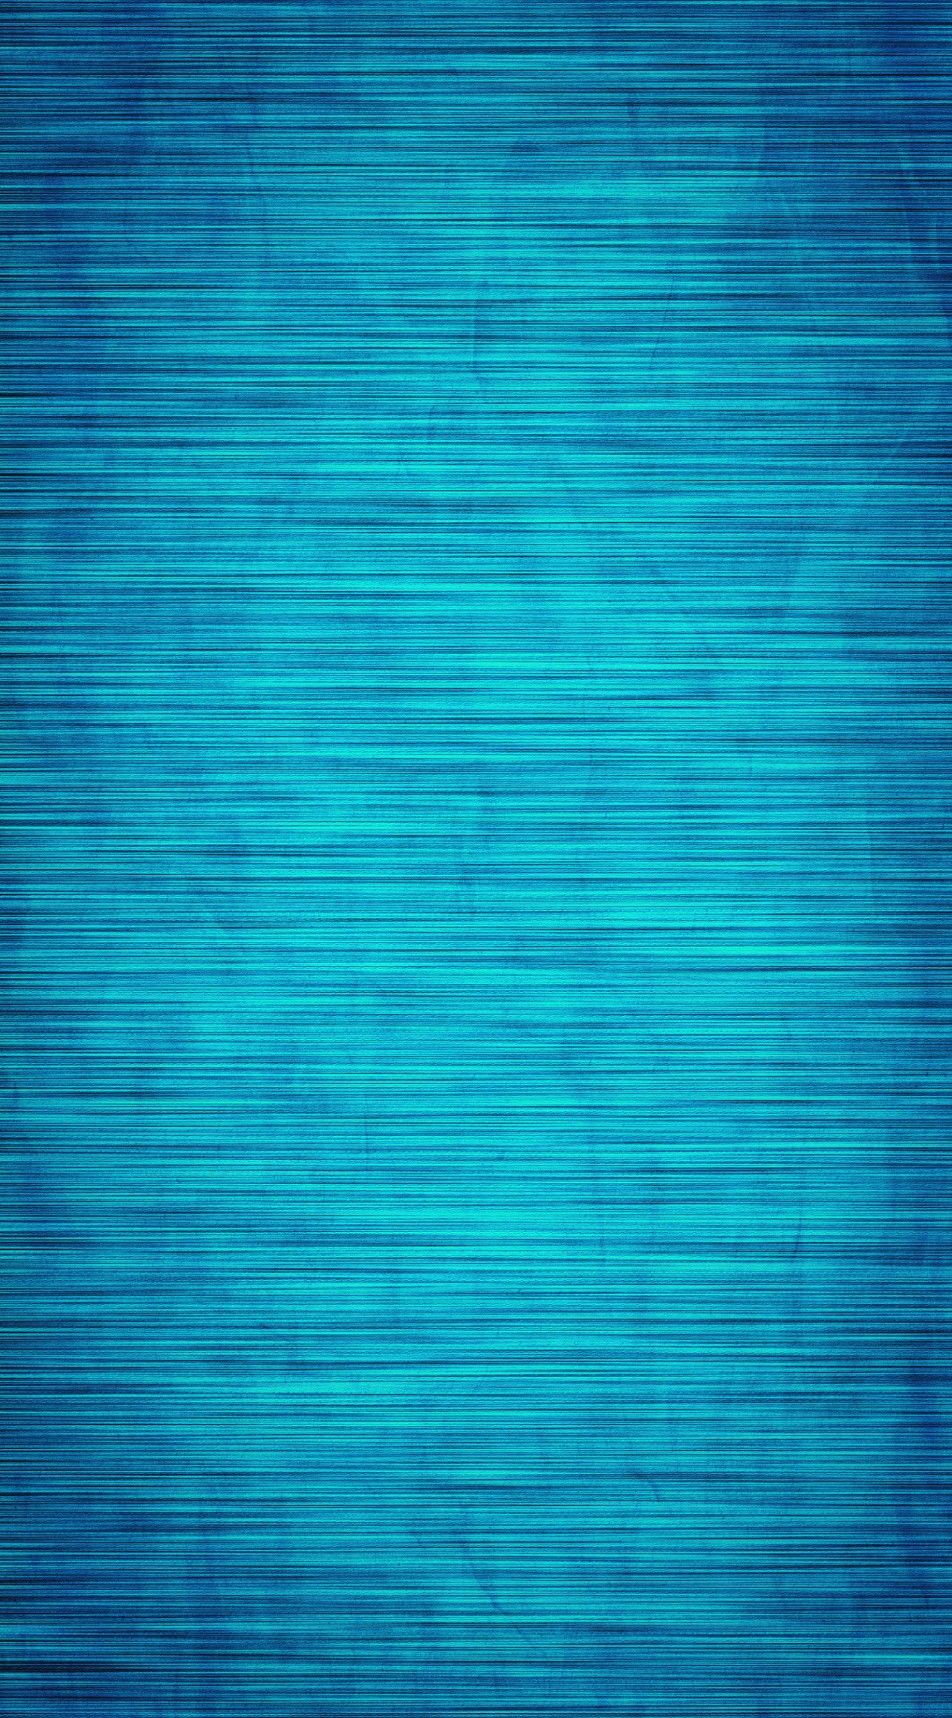 Nike just do it logo iphone wallpaper download roblox - Wallpaper Iphone Wallpaper